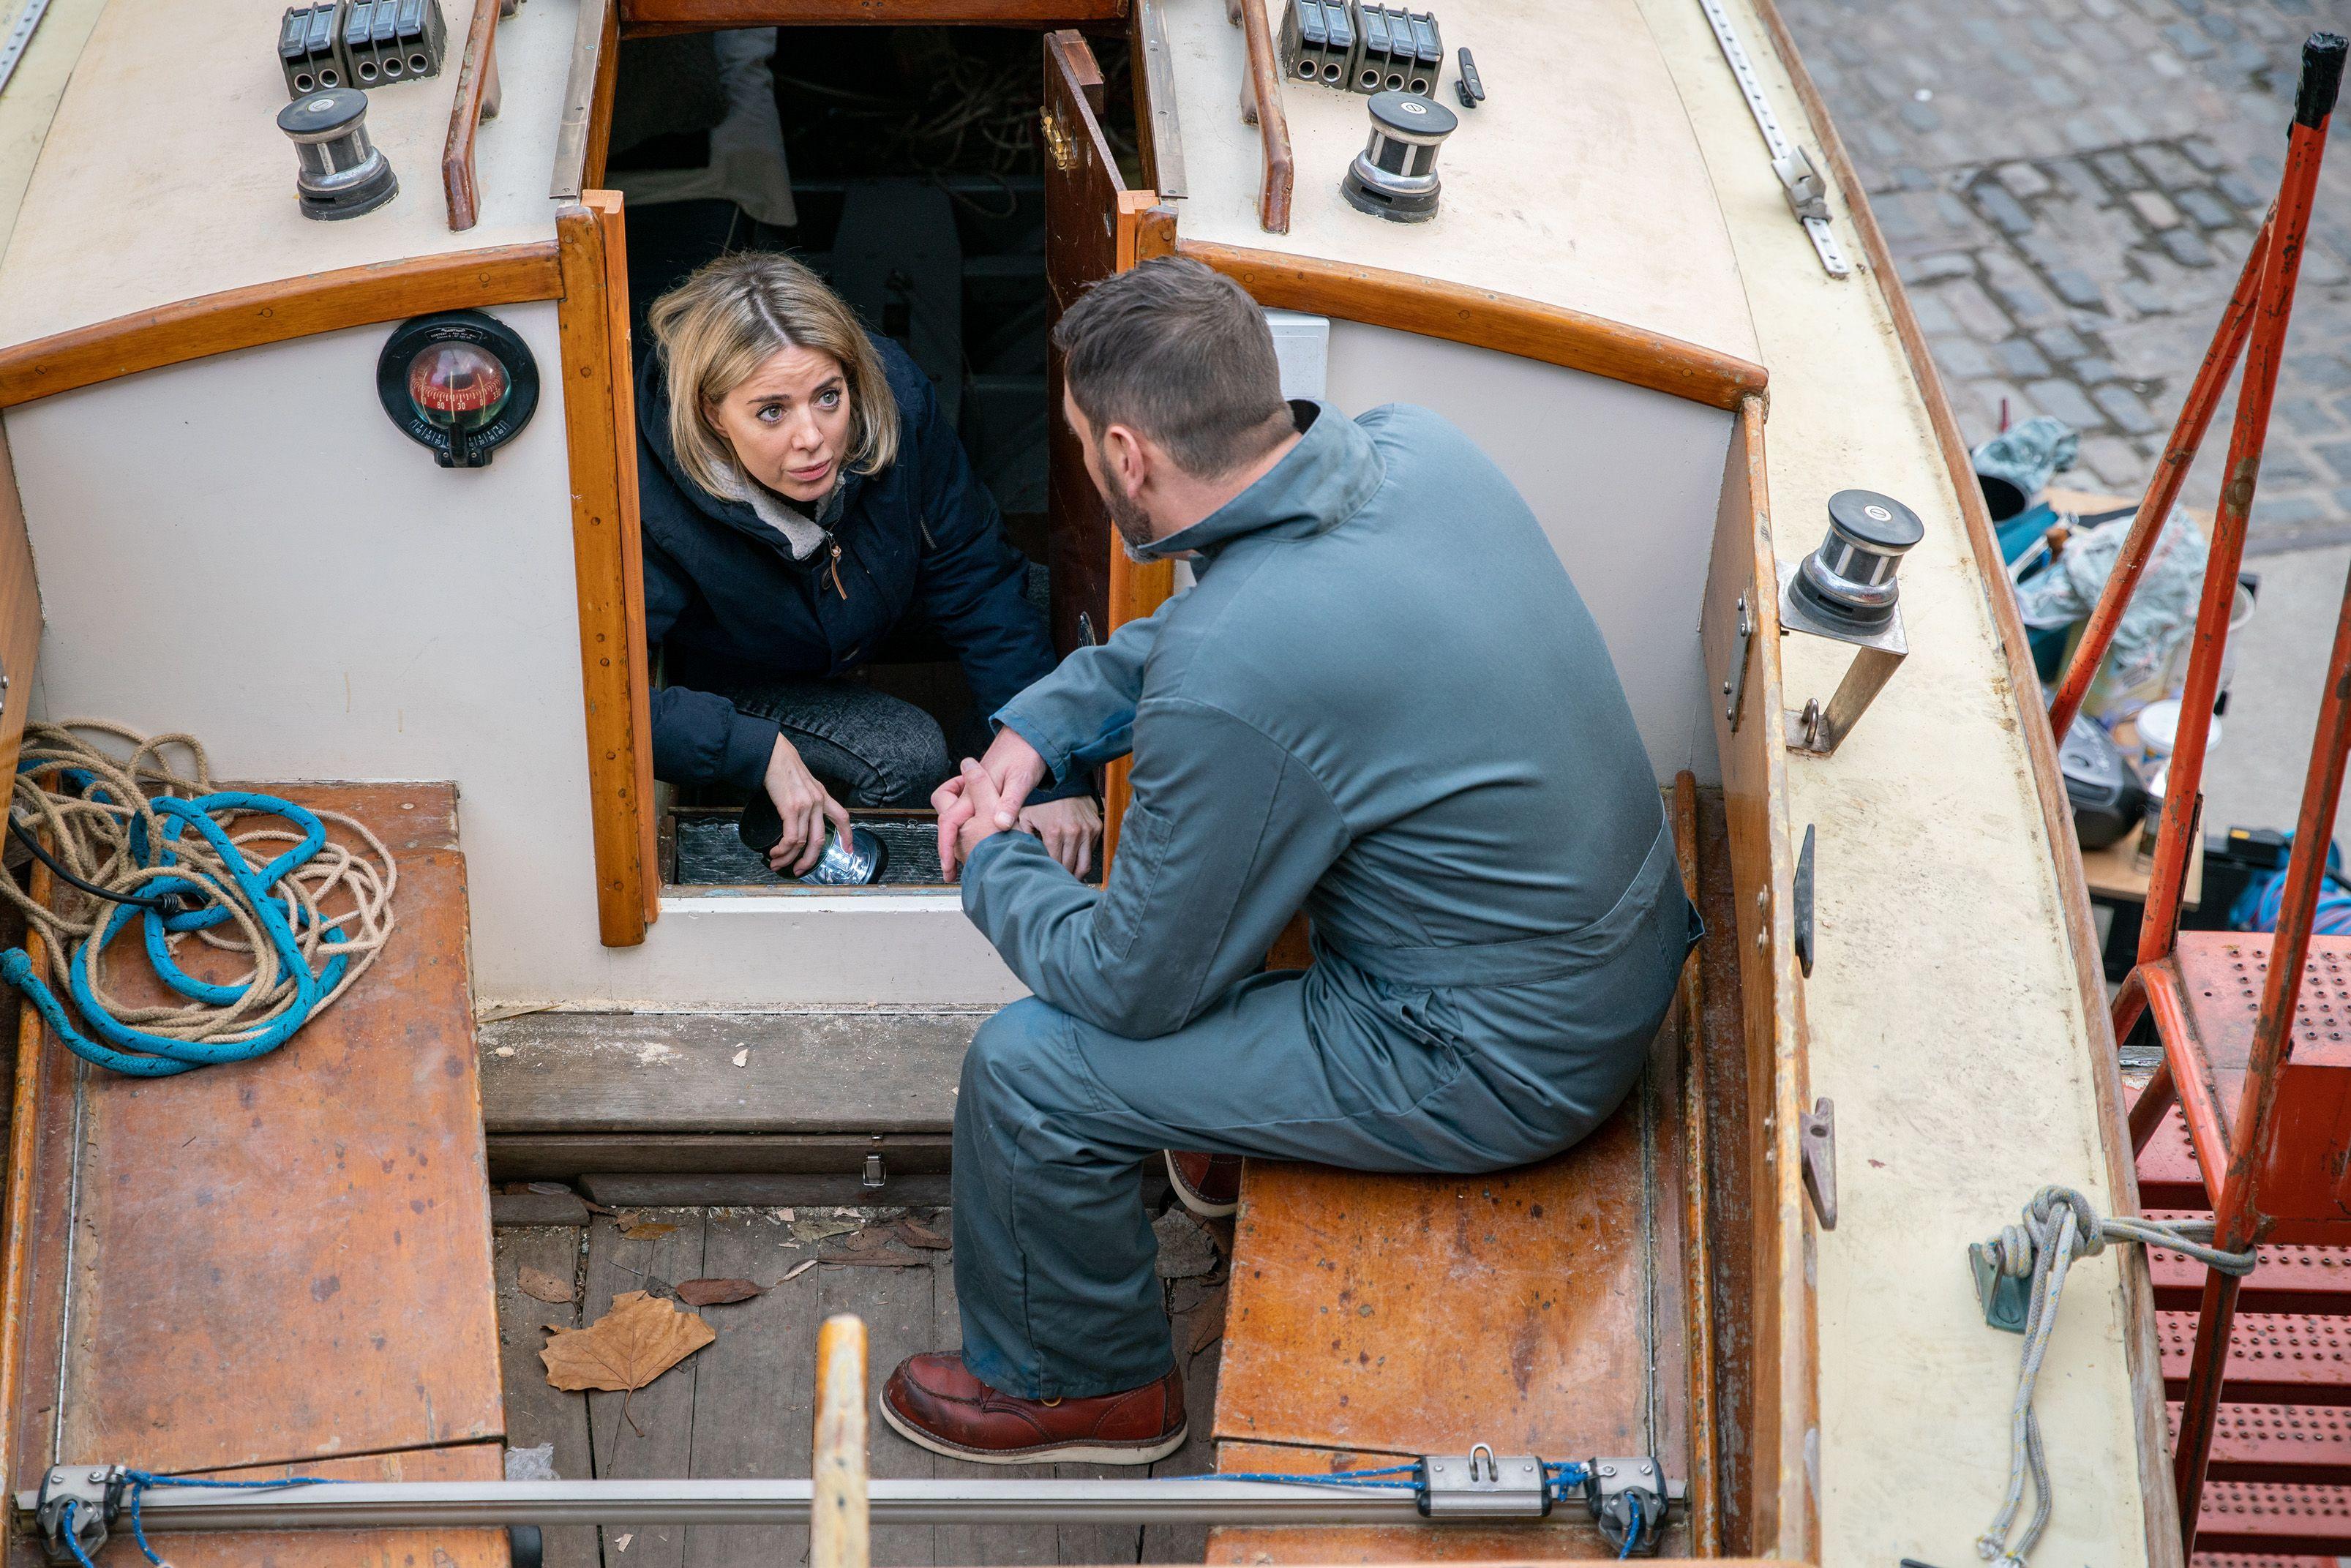 Abi Franklin helps Peter Barlow on the boat in Coronation Street